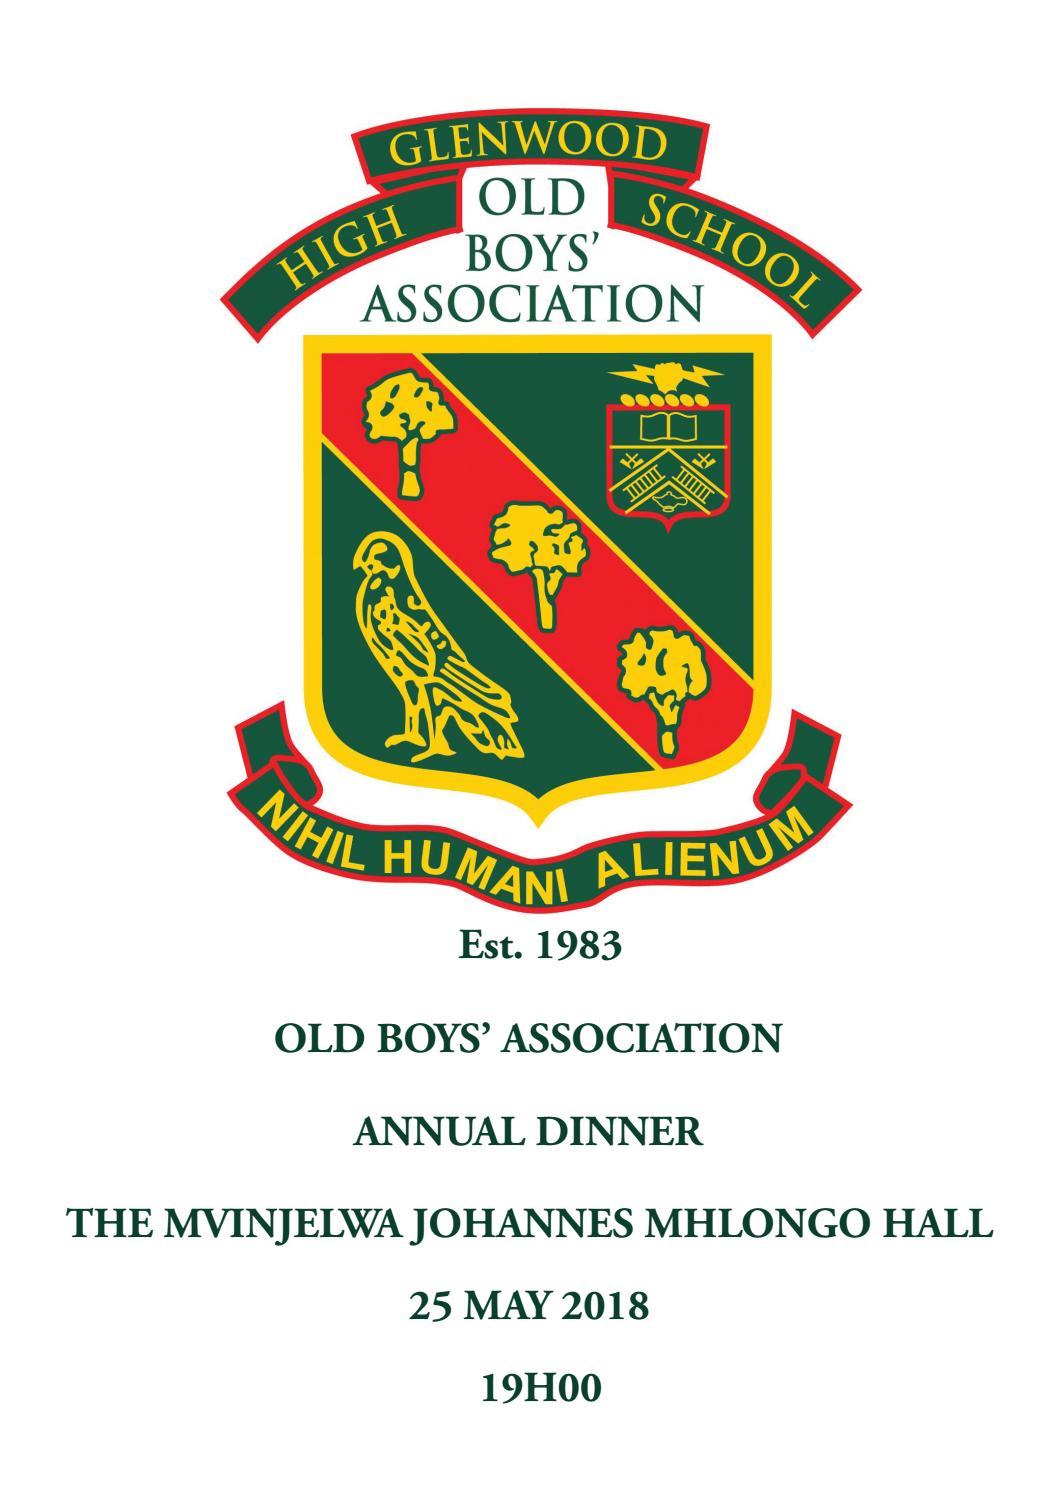 Old boys association programme 2018 by Glenwood High School